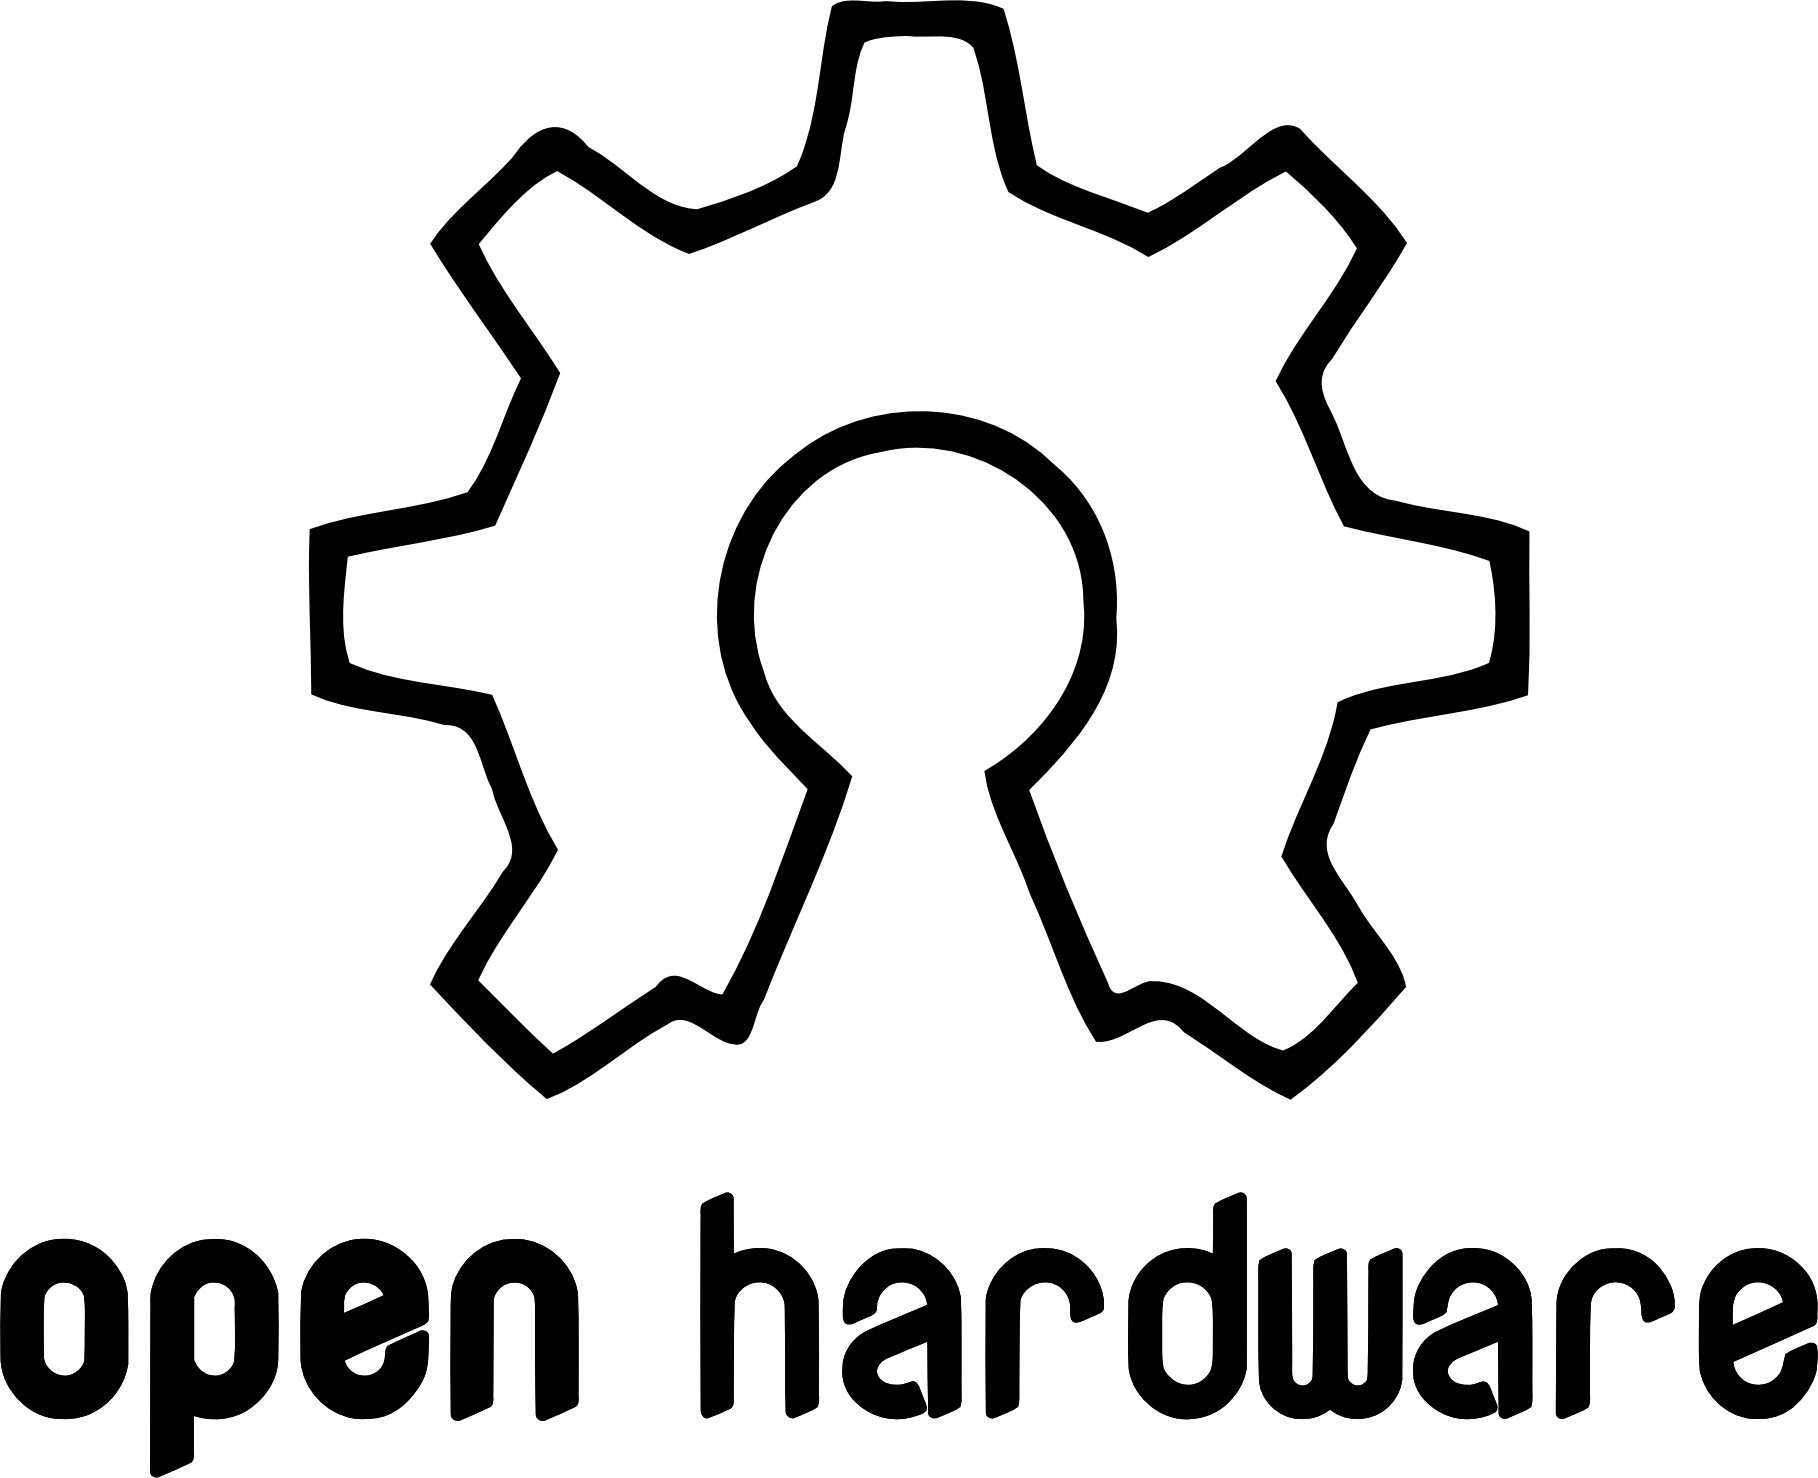 open source hardwa hands - HD1818×1478